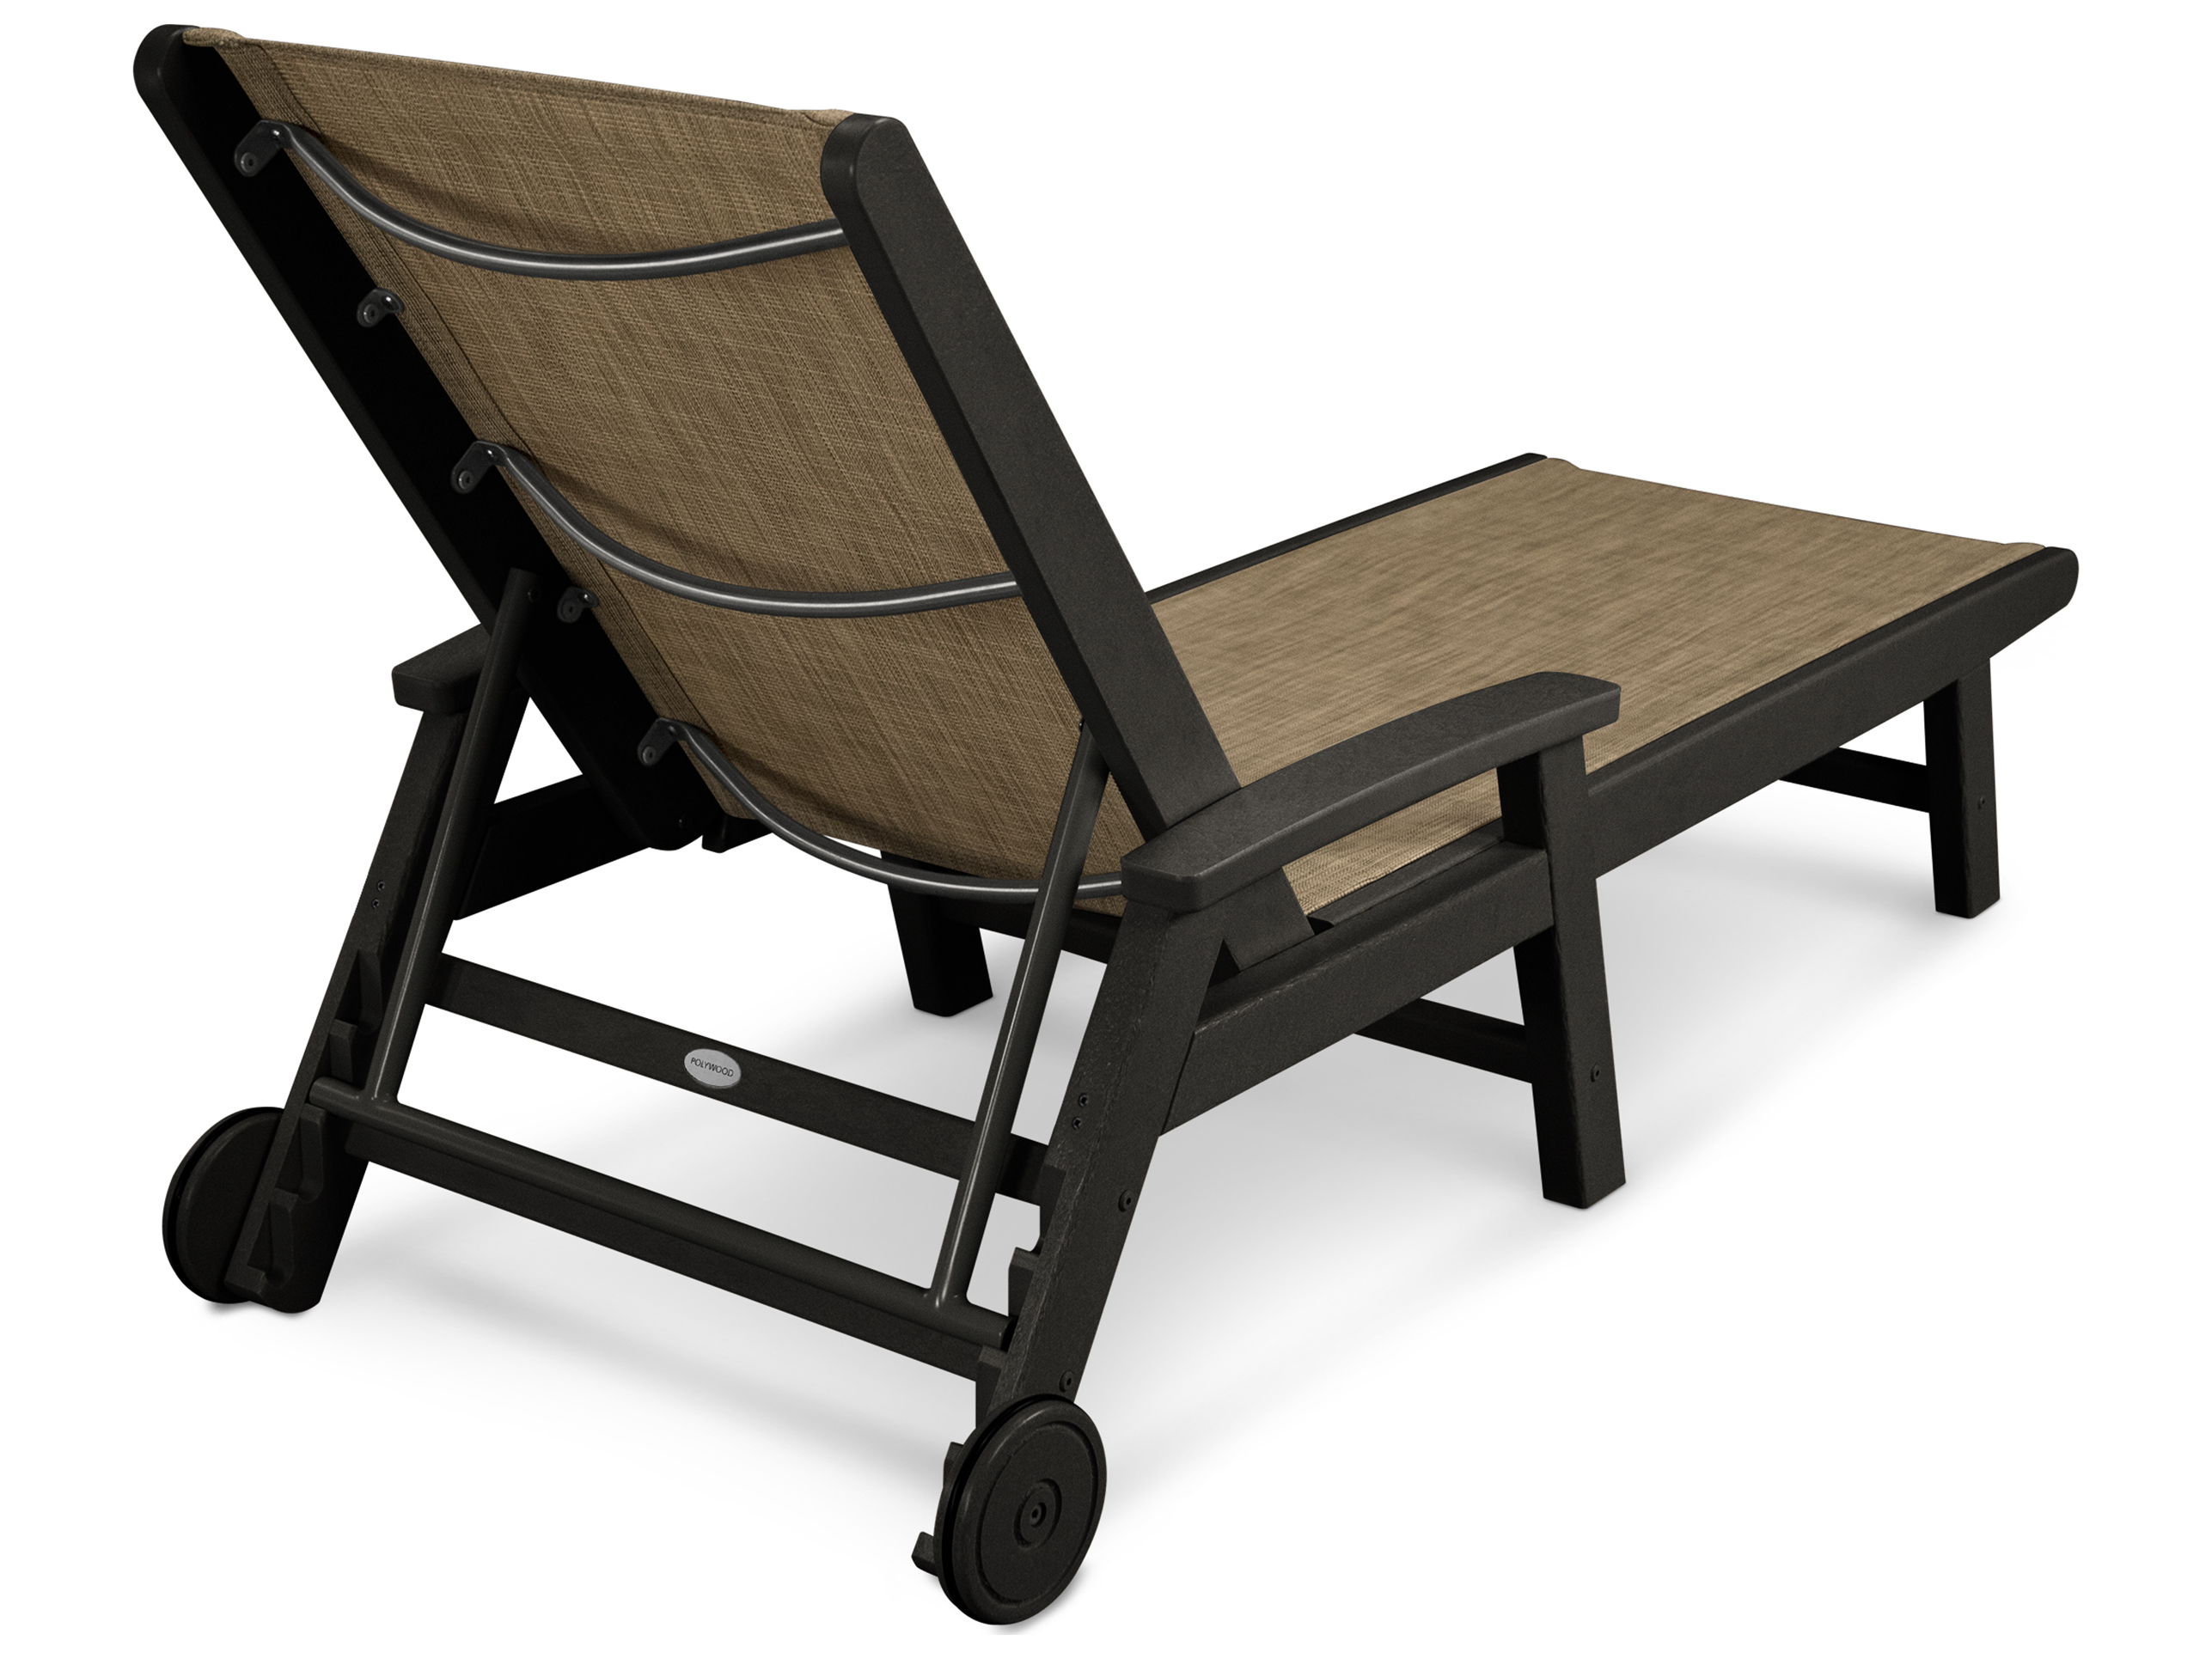 Polywood 174 Coastal Sling Aluminum Chaise Lounge With Wheels